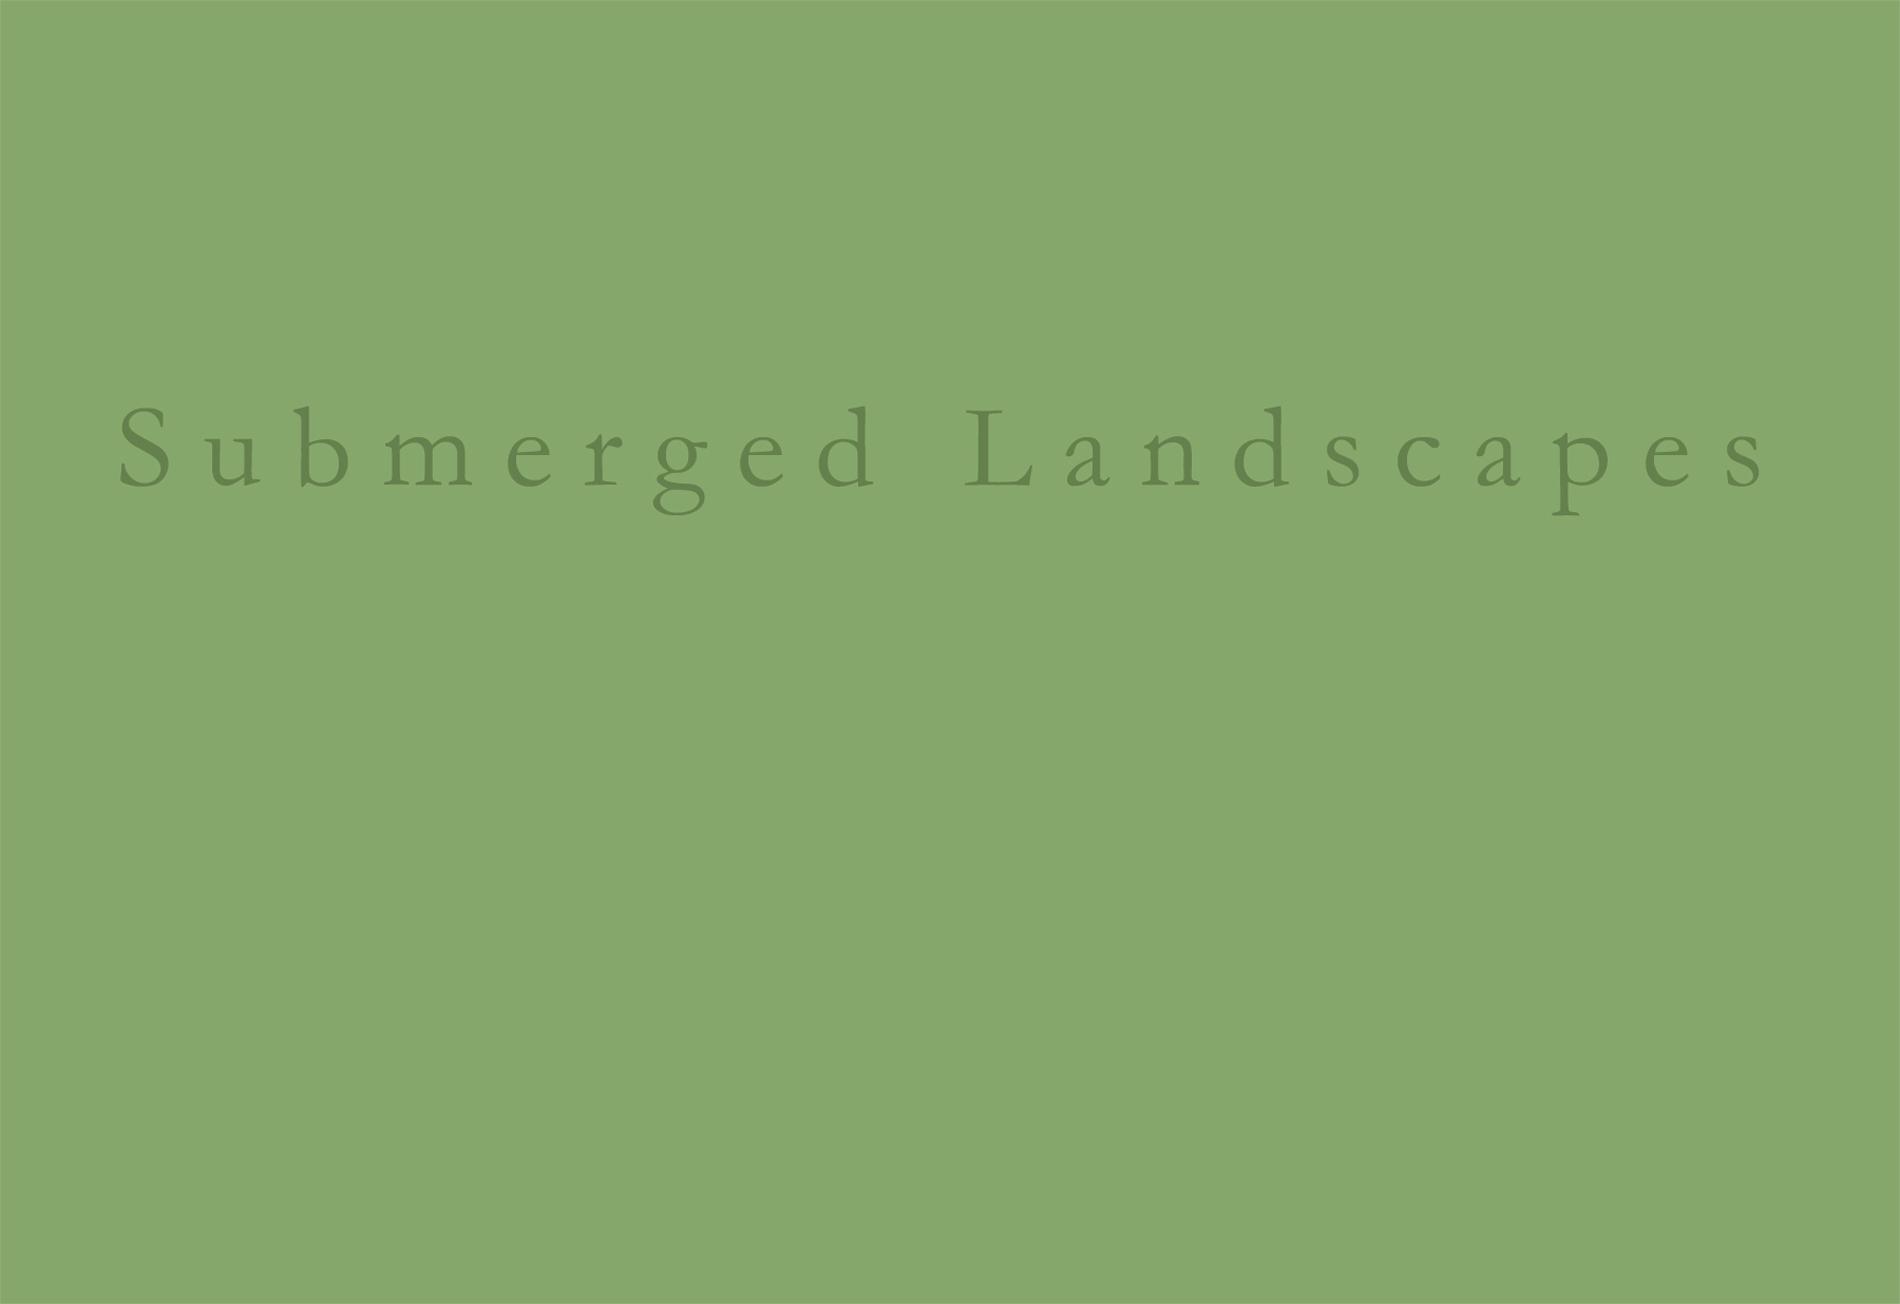 SUBMERGED LANDSCAPES